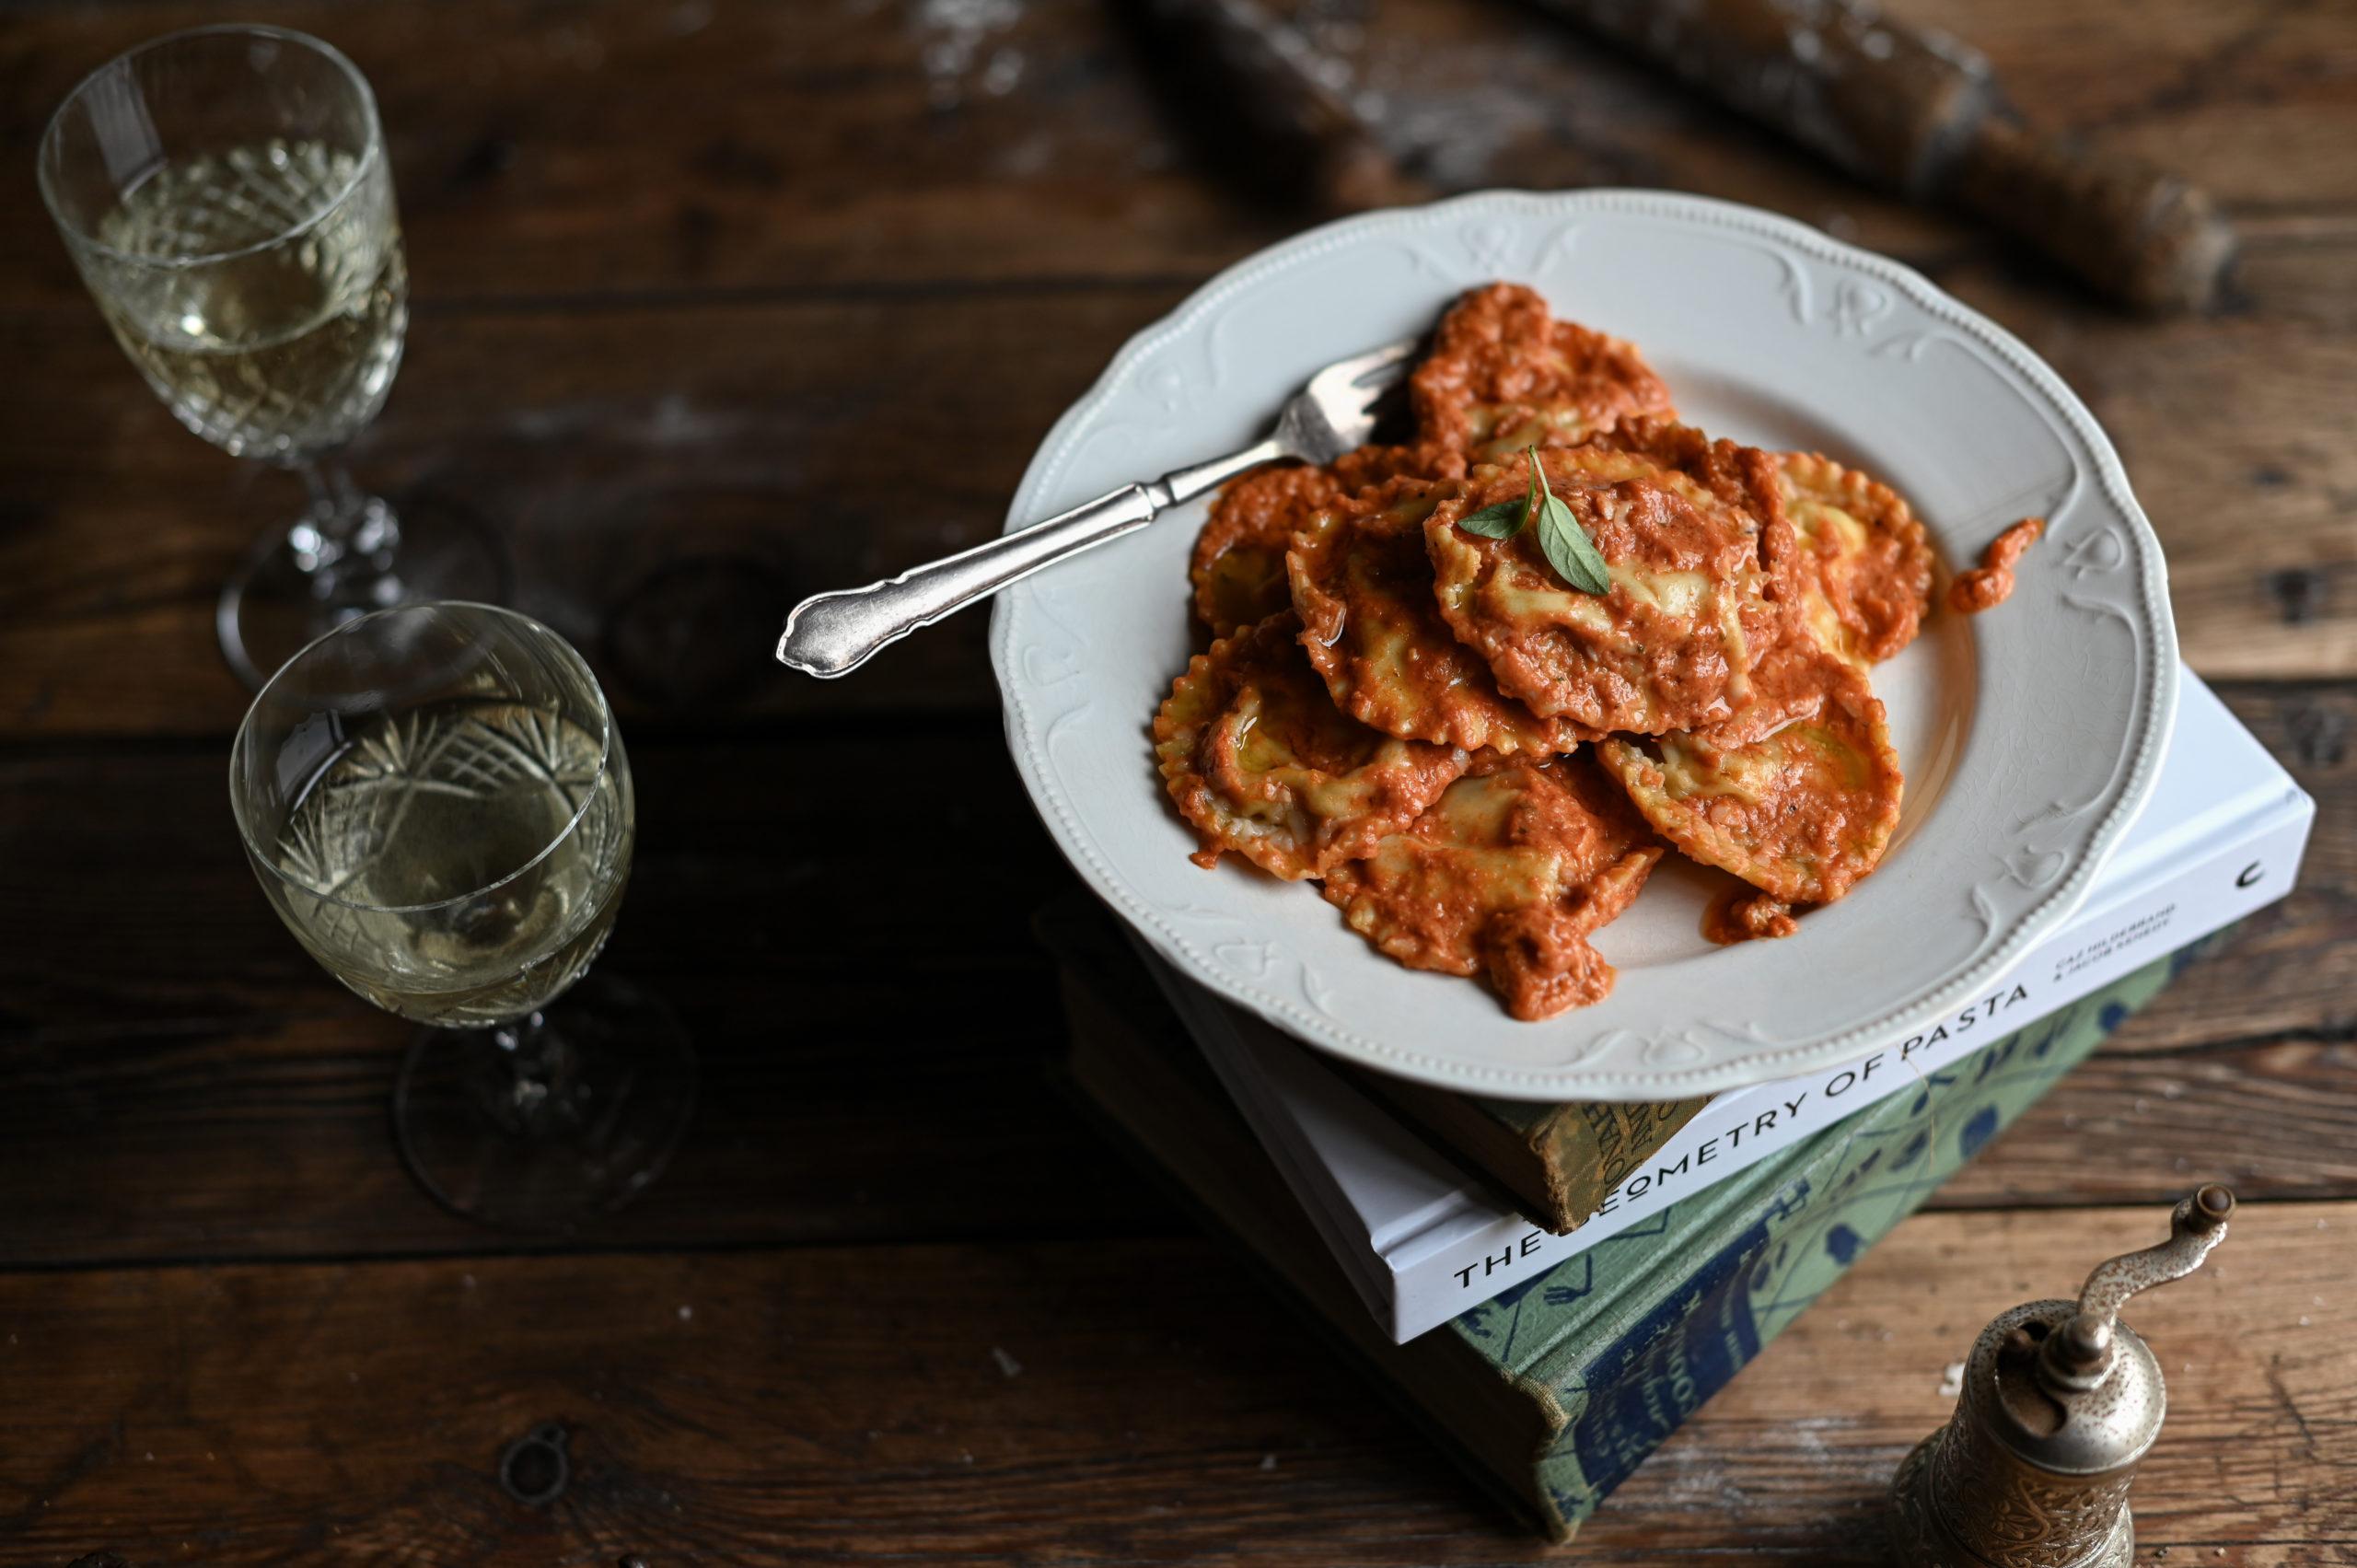 TUSCAN-STYLE RAVIOLI IN A CREAMY TOMATO SAUCE